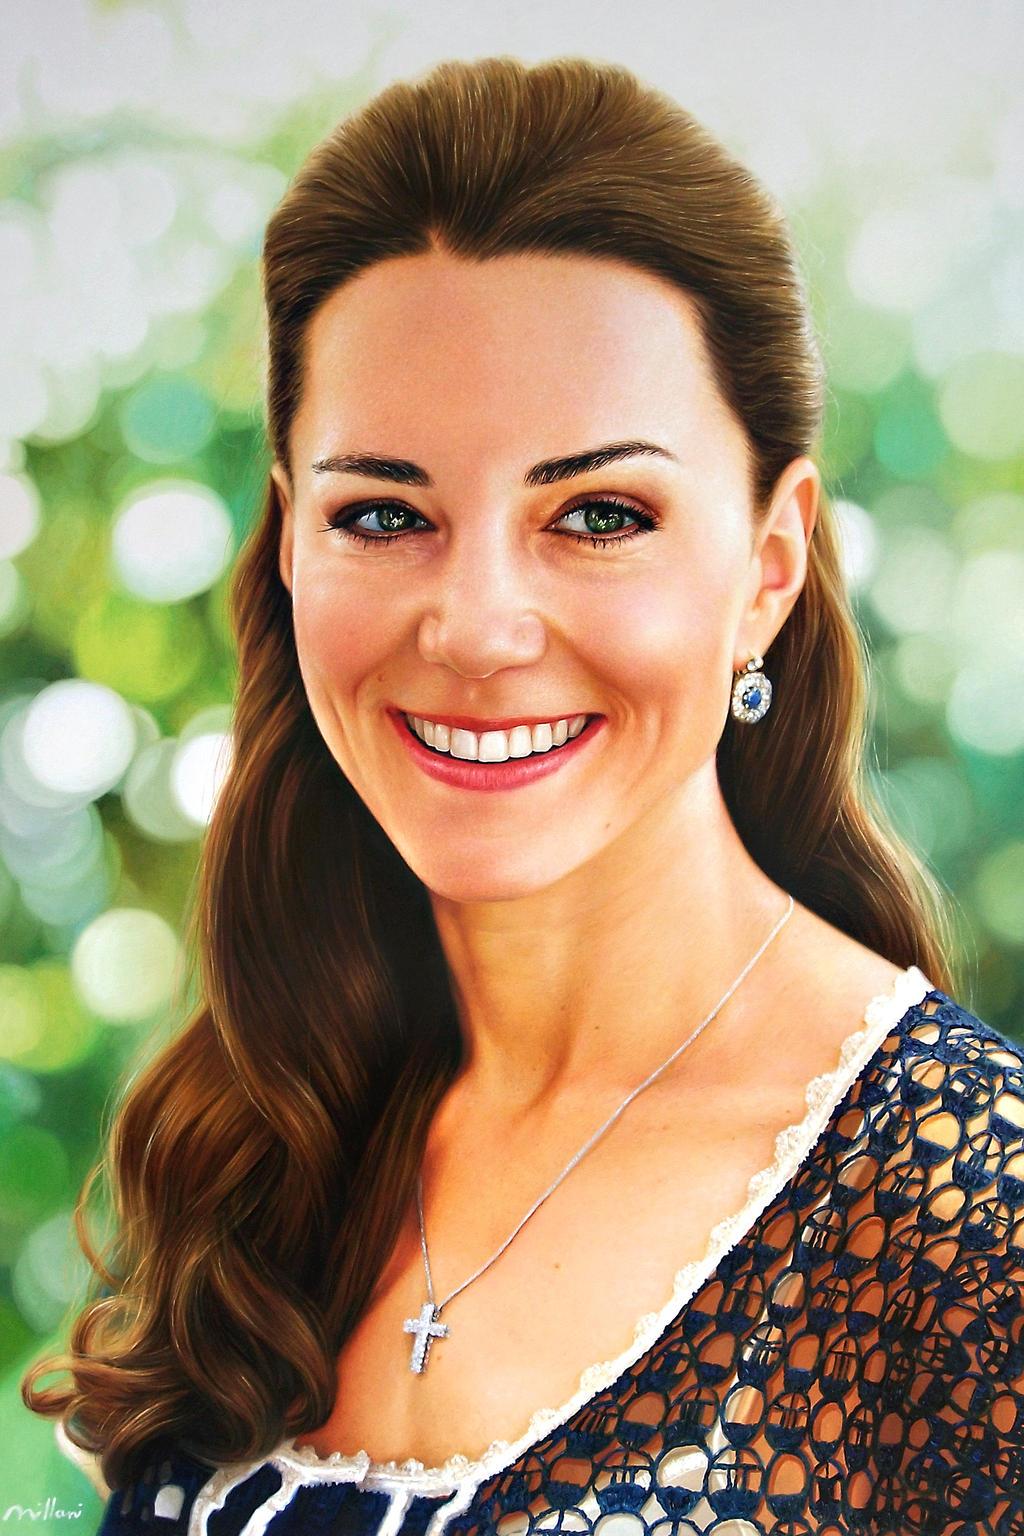 Princesa Kate Middleton by fabianoMillani